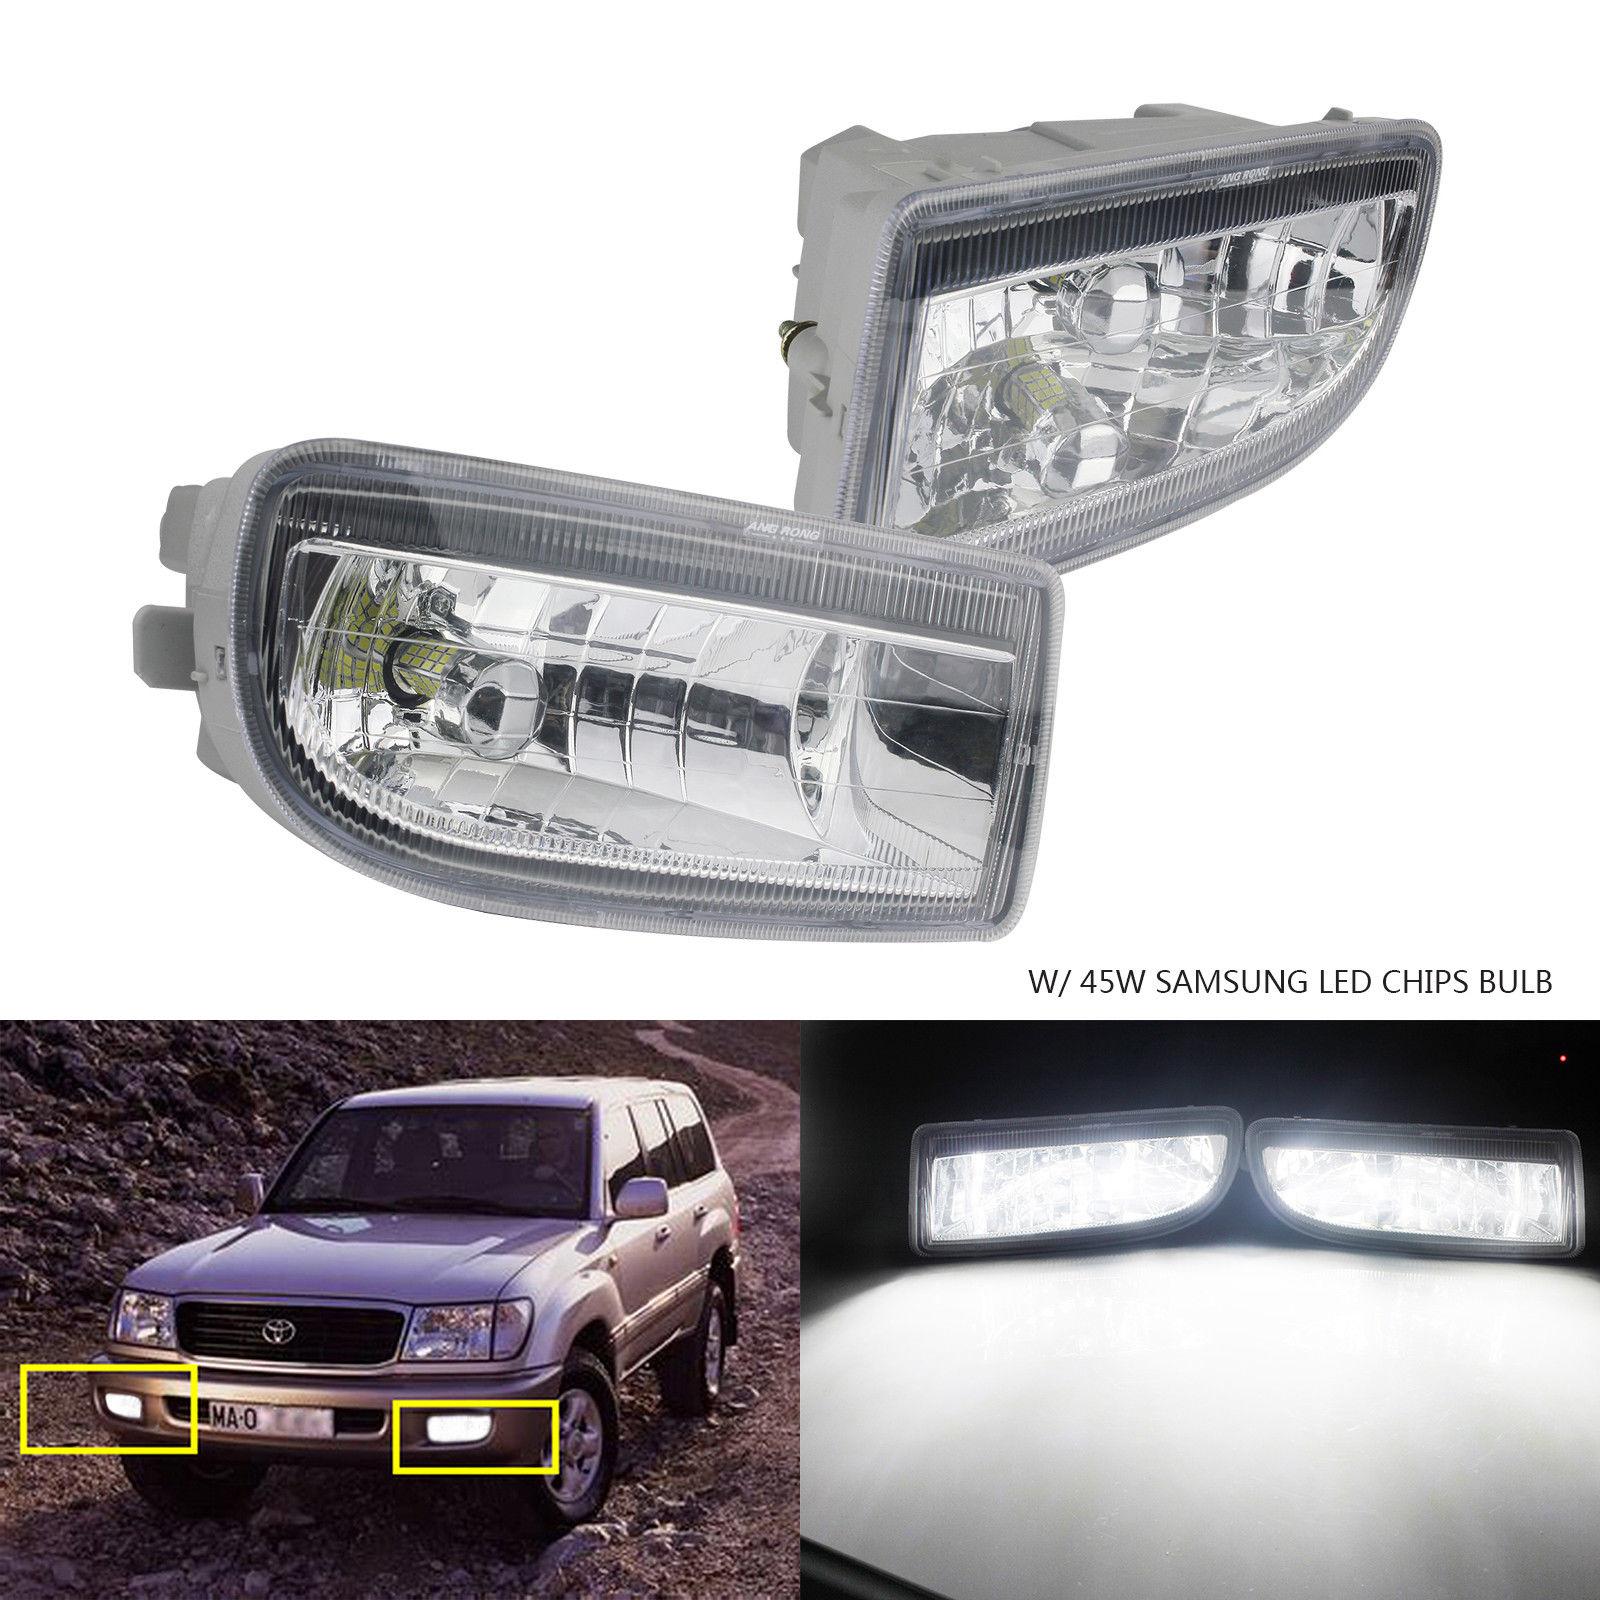 ANGRONG 2x Blanc SAMSUNG 45 w 2000LM HB4 9006 Brouillard Lumière LED Ampoules Pour Toyota Land Cruiser Amazon FJ100/ FJ105 1998-2